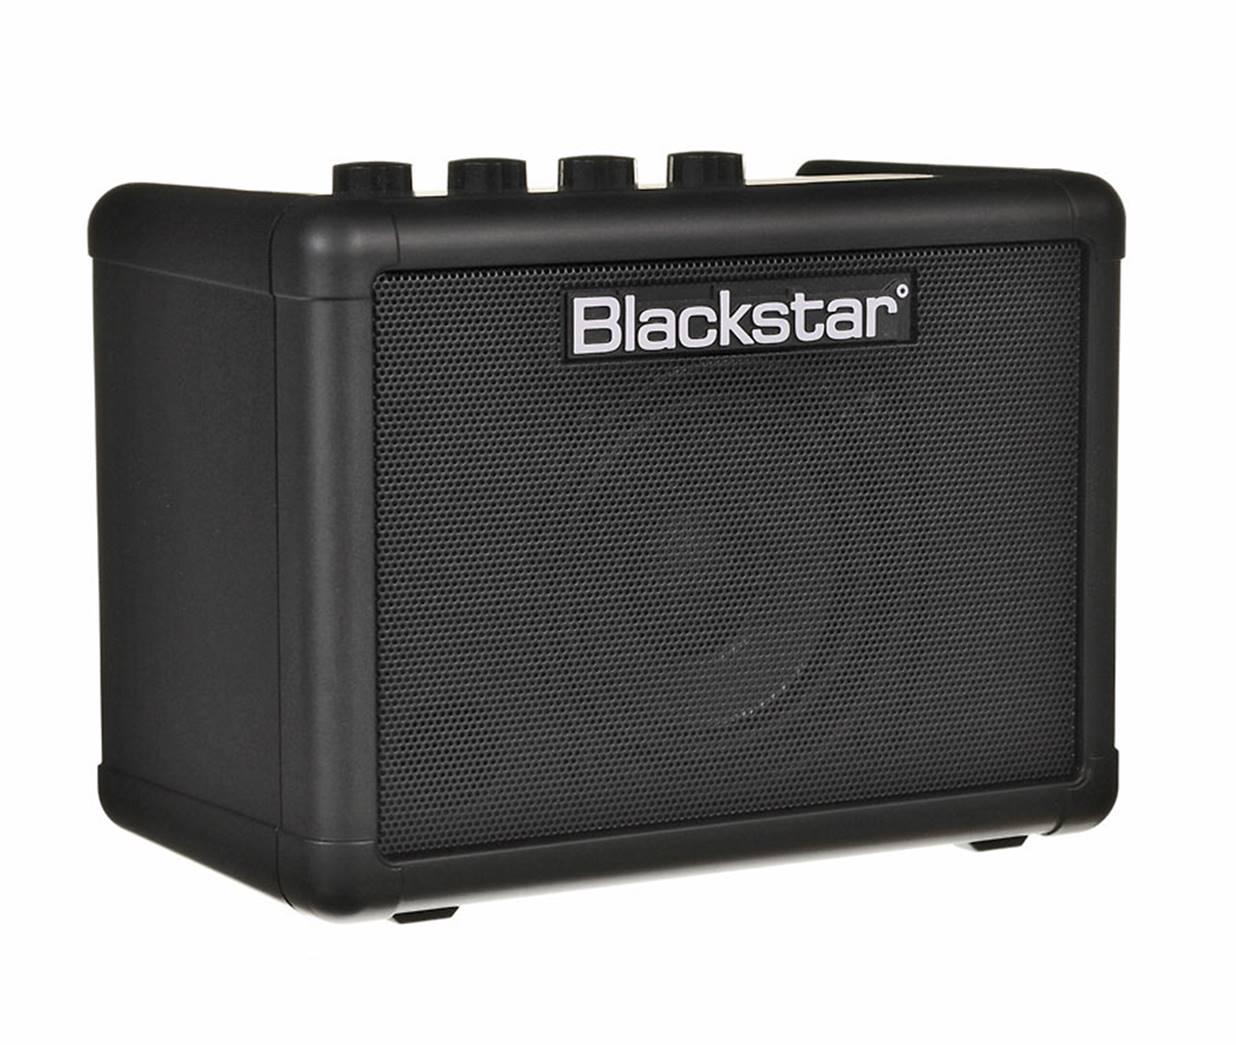 Blackstar FLY3 Guitar Amp